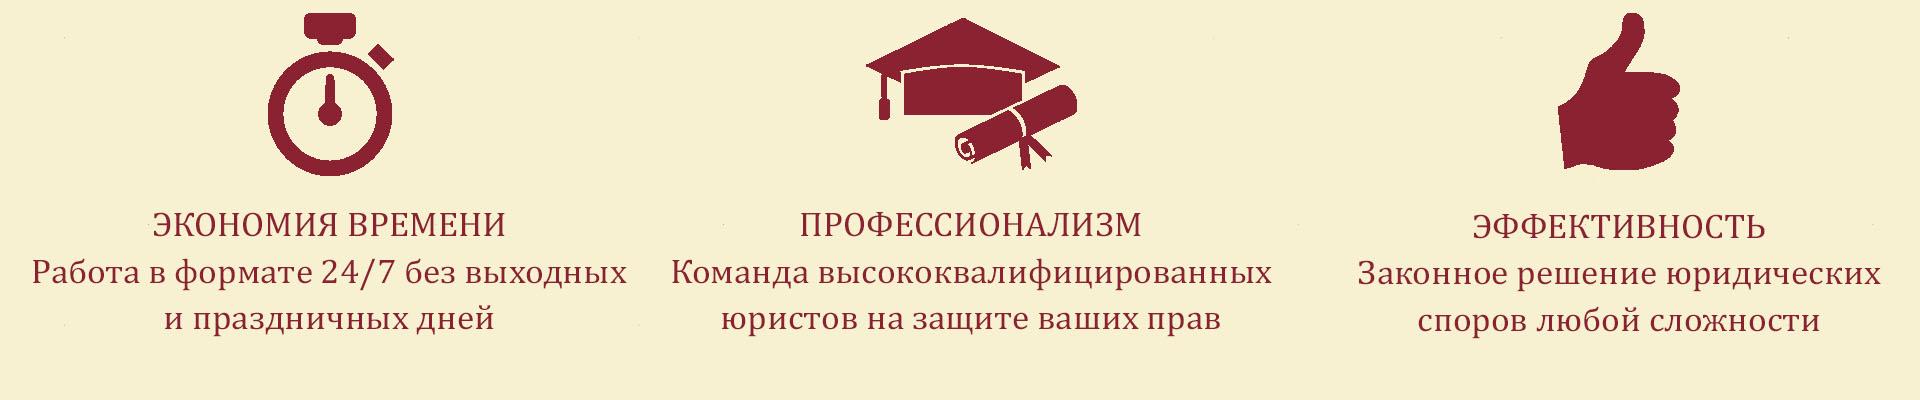 nedorogoj_yurist_v_barnaule